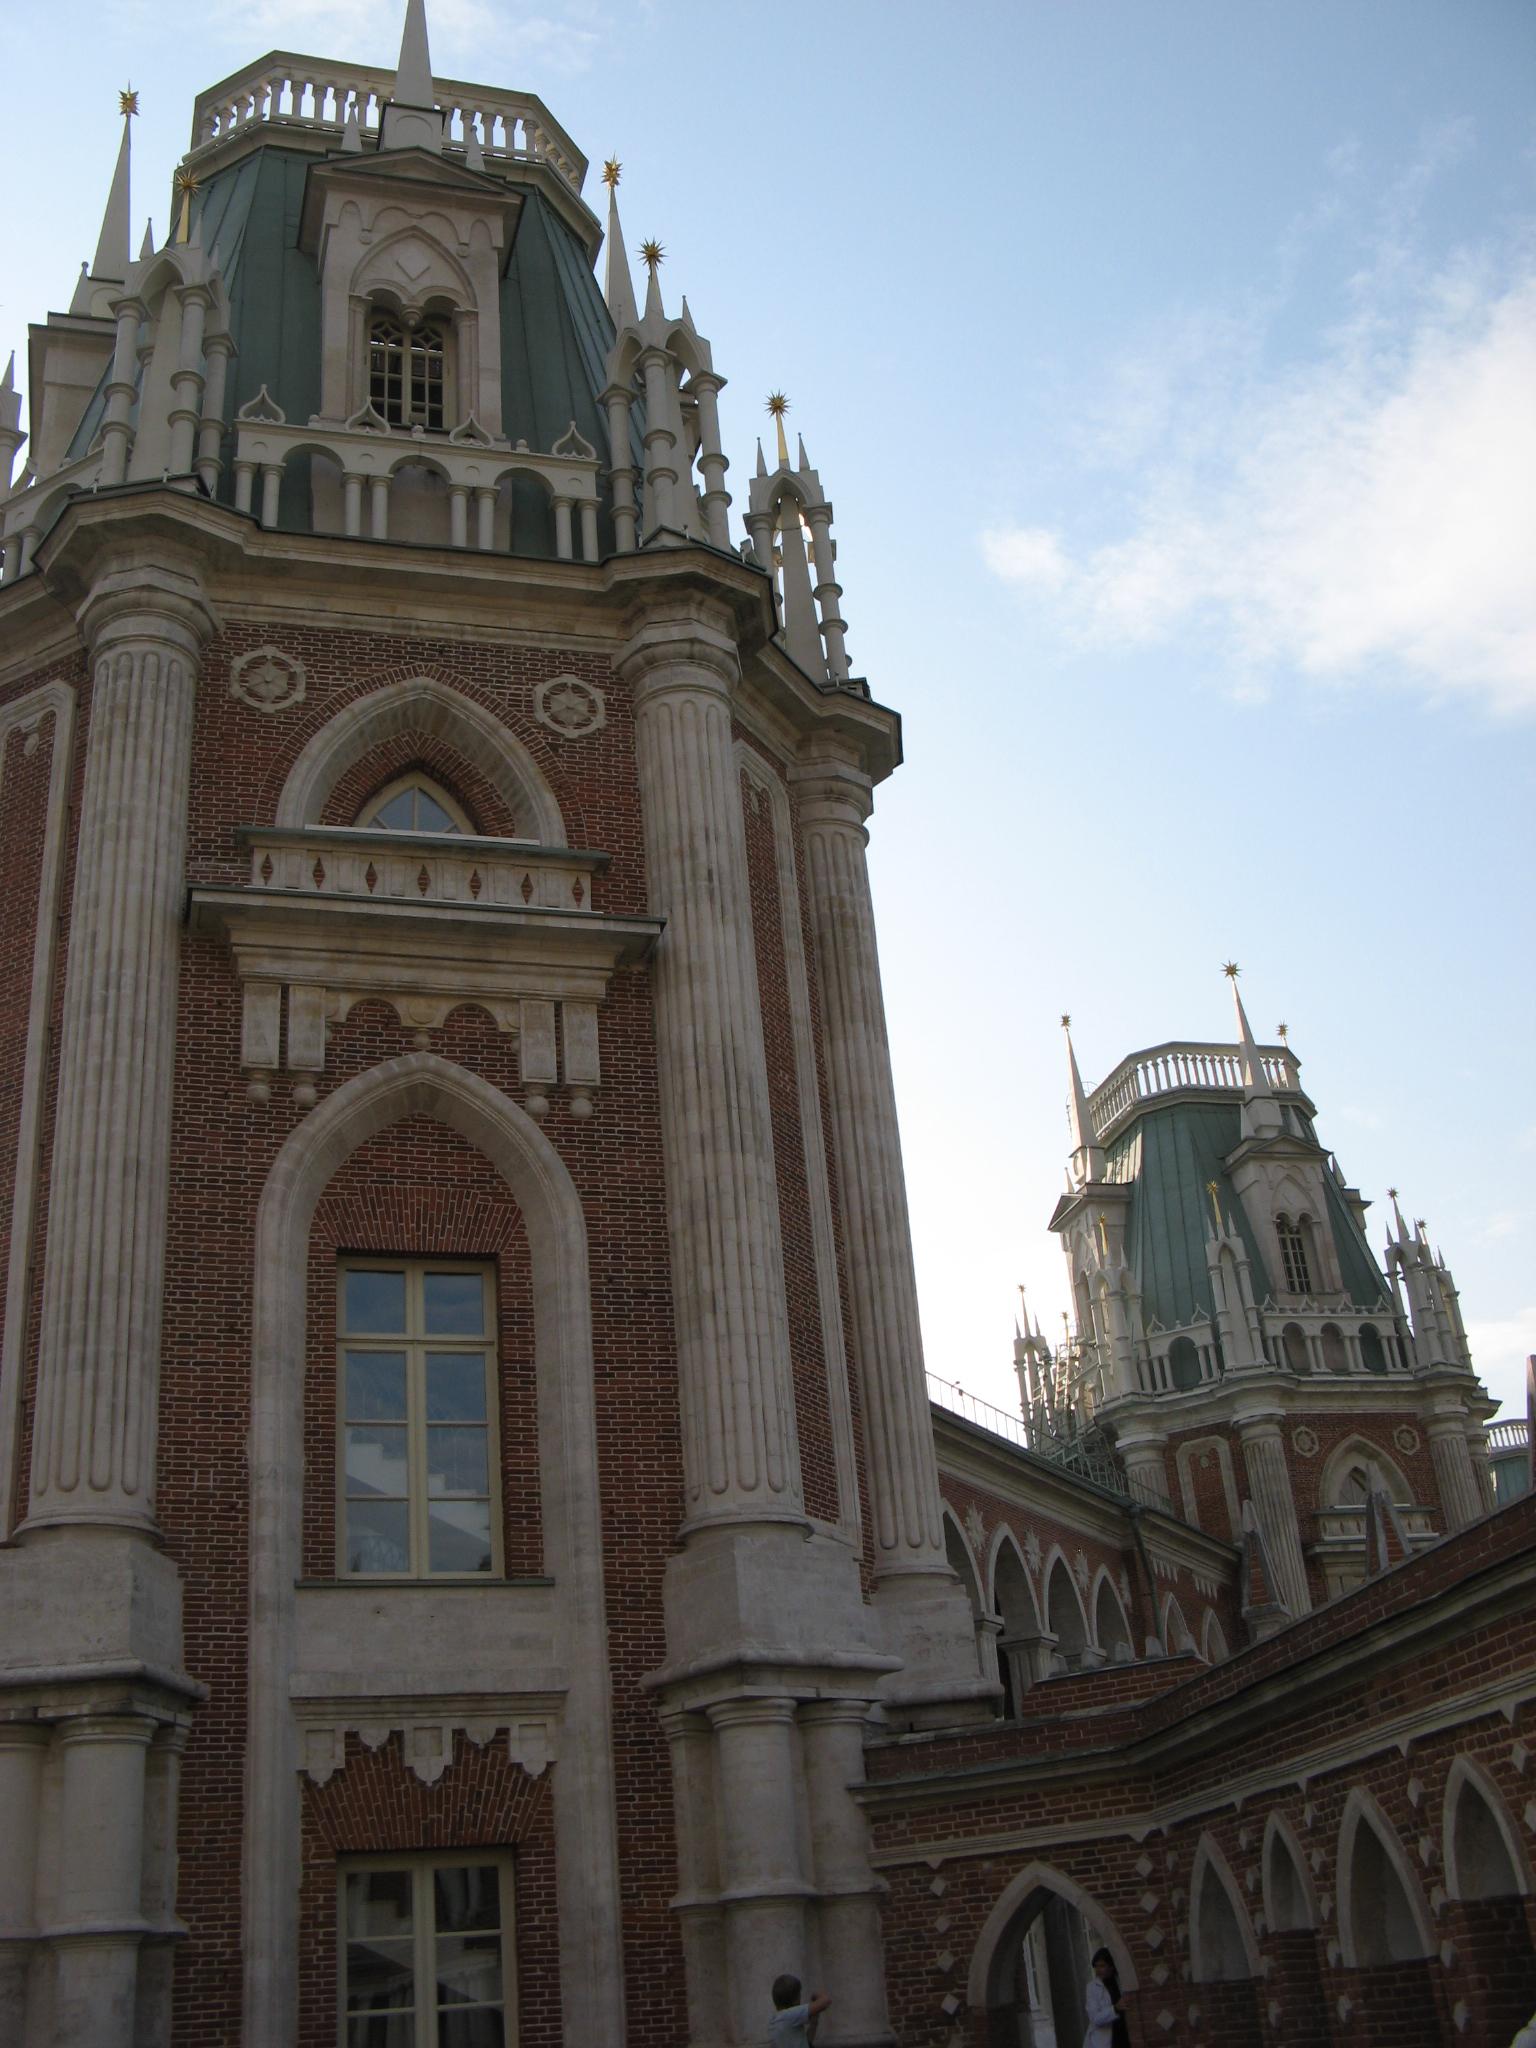 Одна из башен Большого дворца, Царицыно, Москва